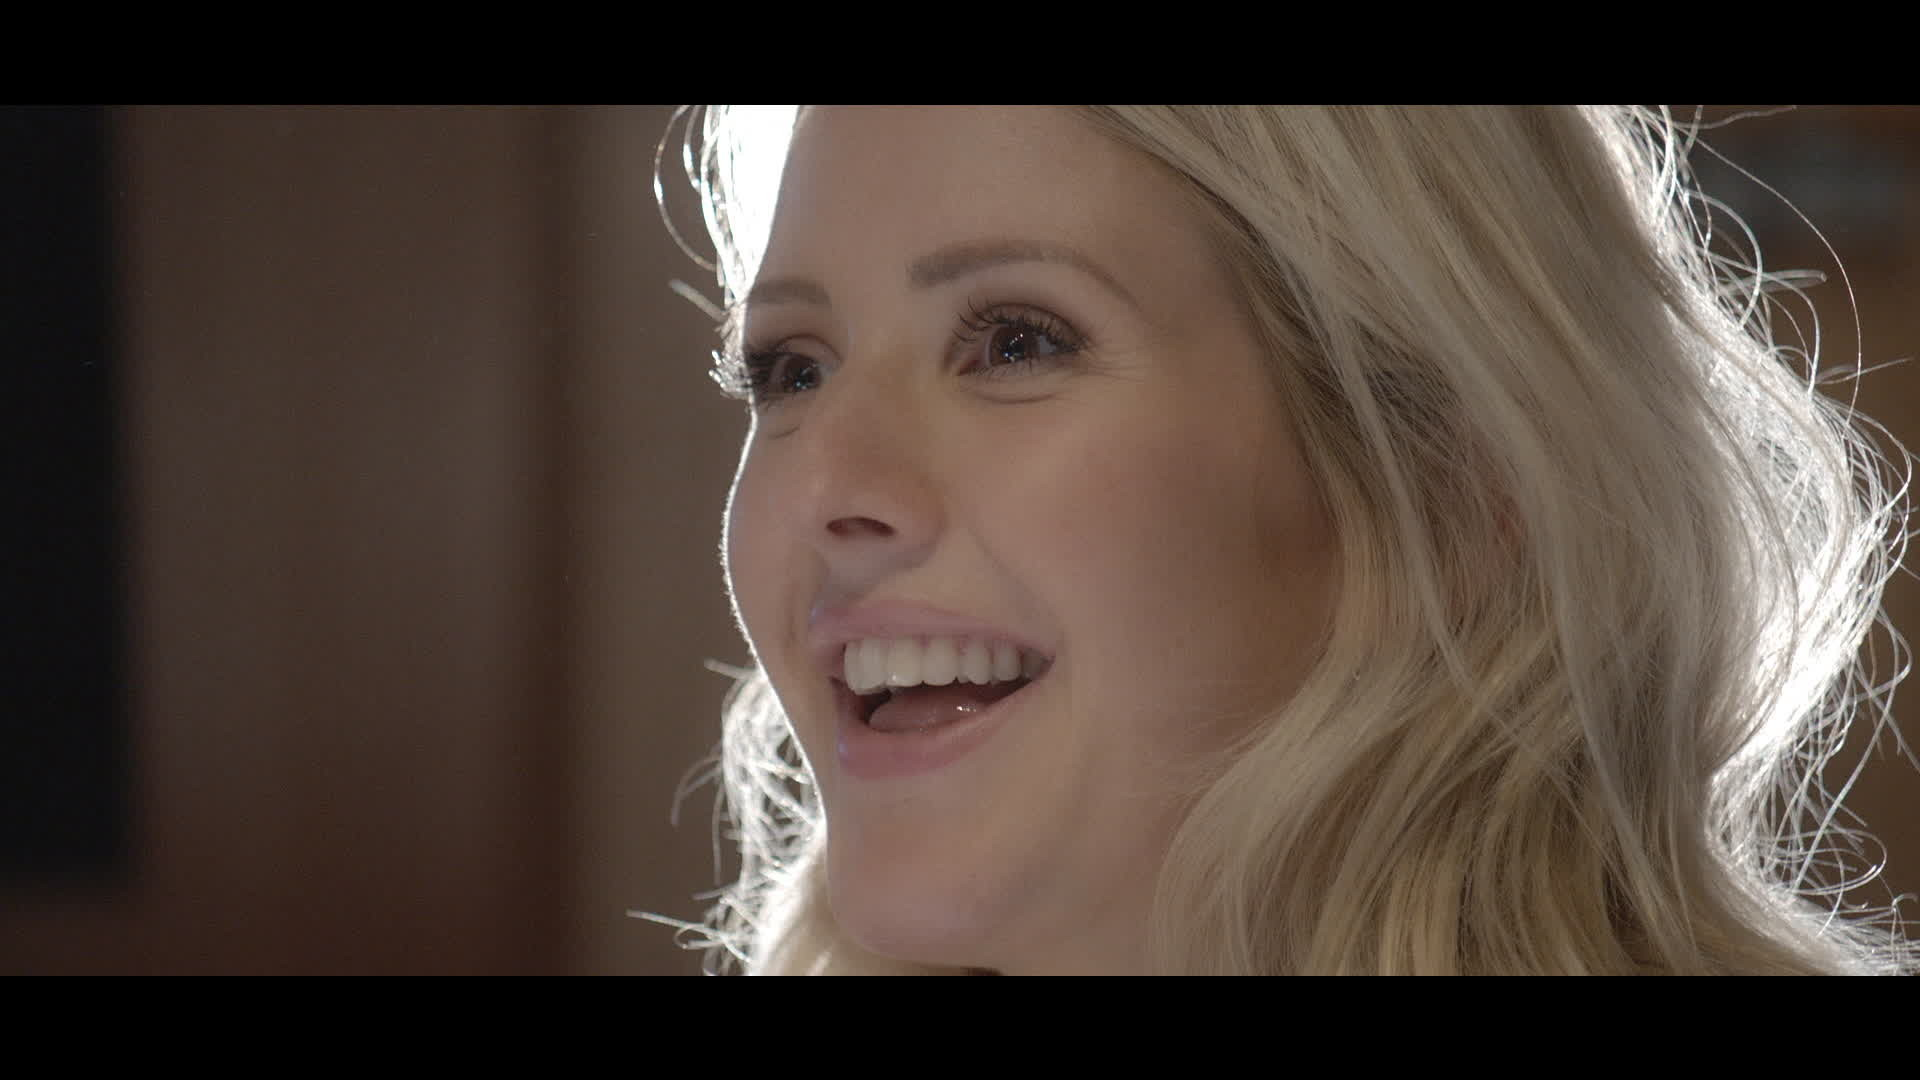 Ellie Goulding – Love Me Like You Do [Live] Video